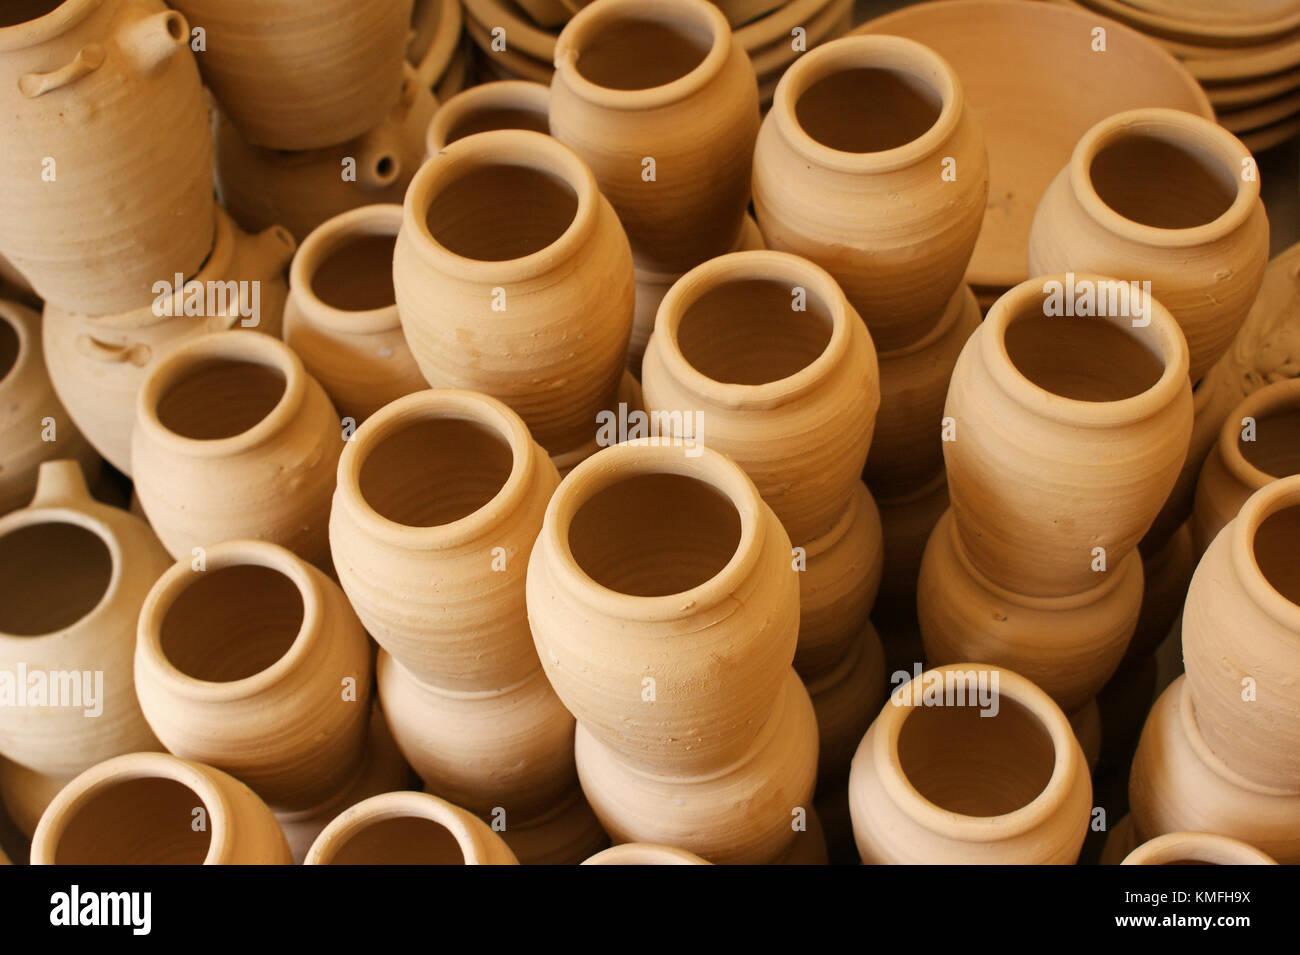 Keramik Singkawang, West Kalimantan, Indonesia - Stock Image